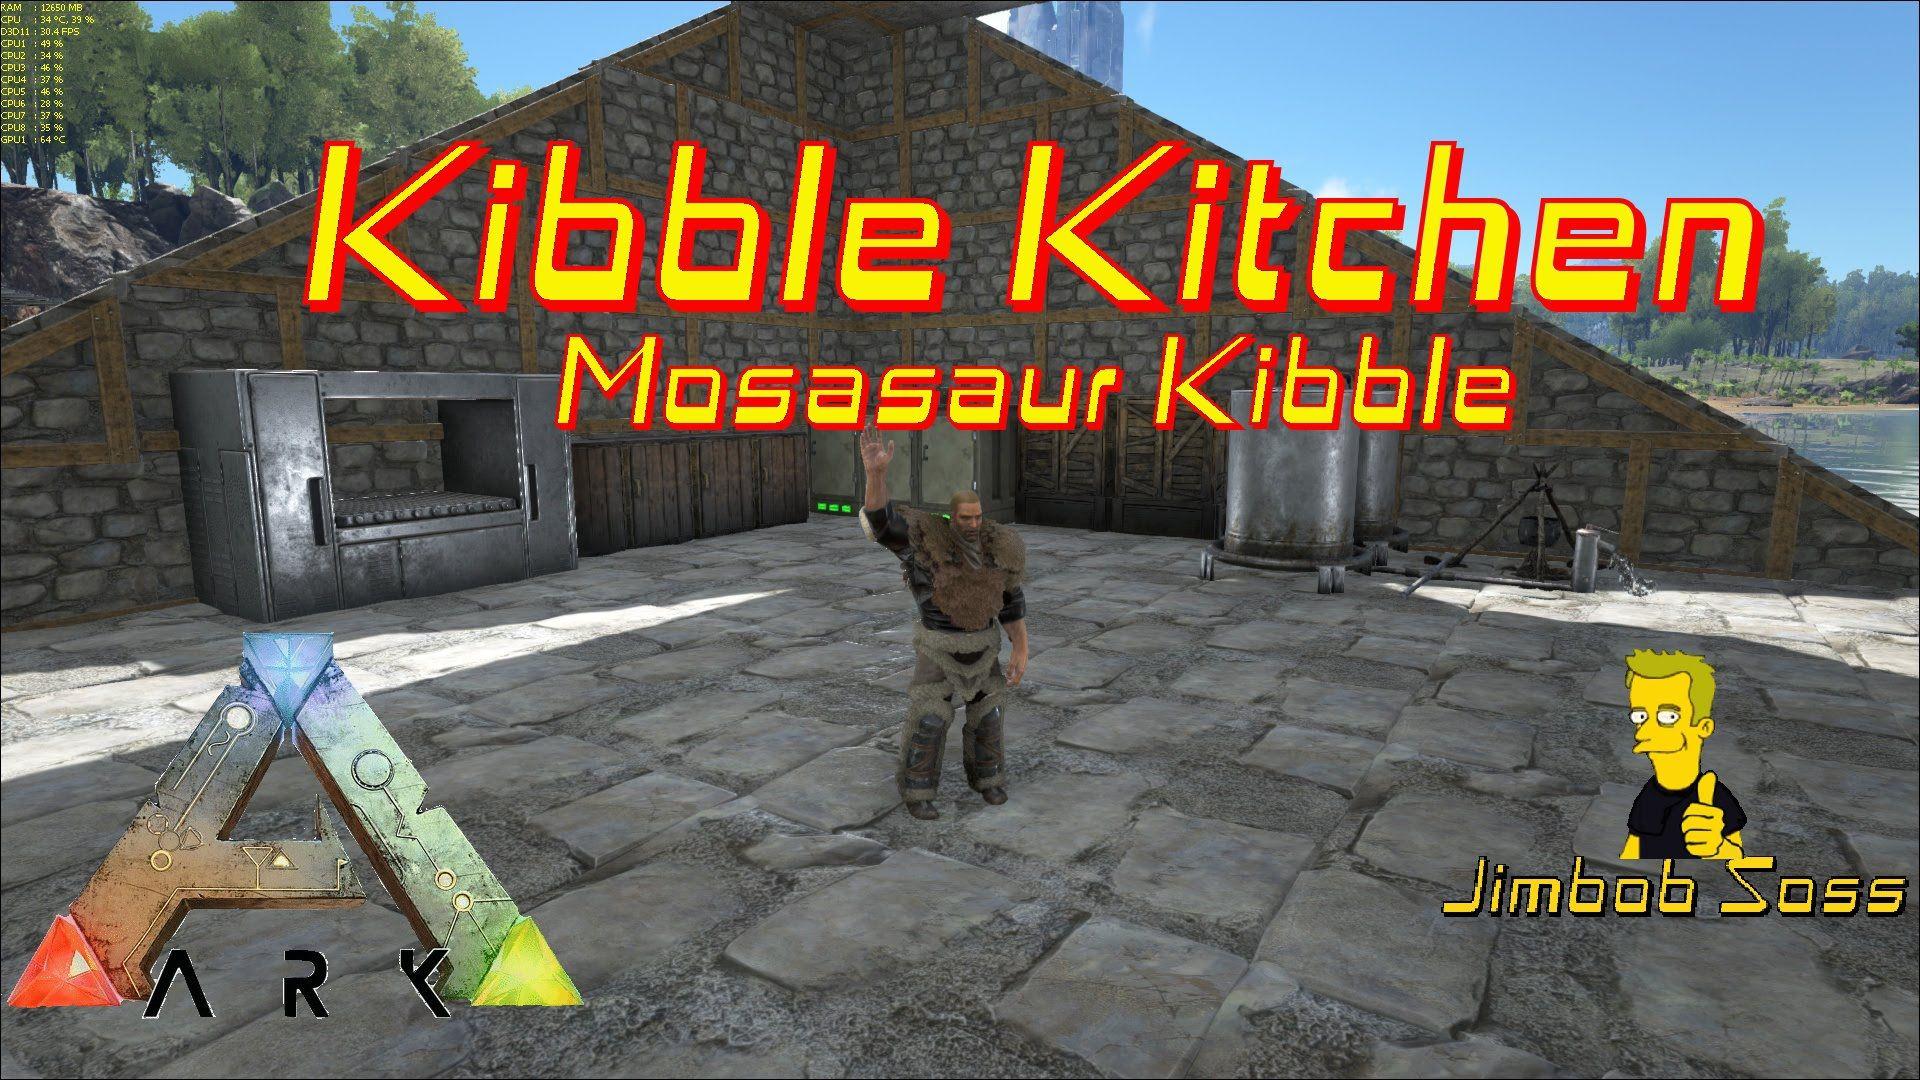 Quetzal egg kibble for 120 mosasaur games pinterest quetzal egg kibble for 120 mosasaur malvernweather Choice Image